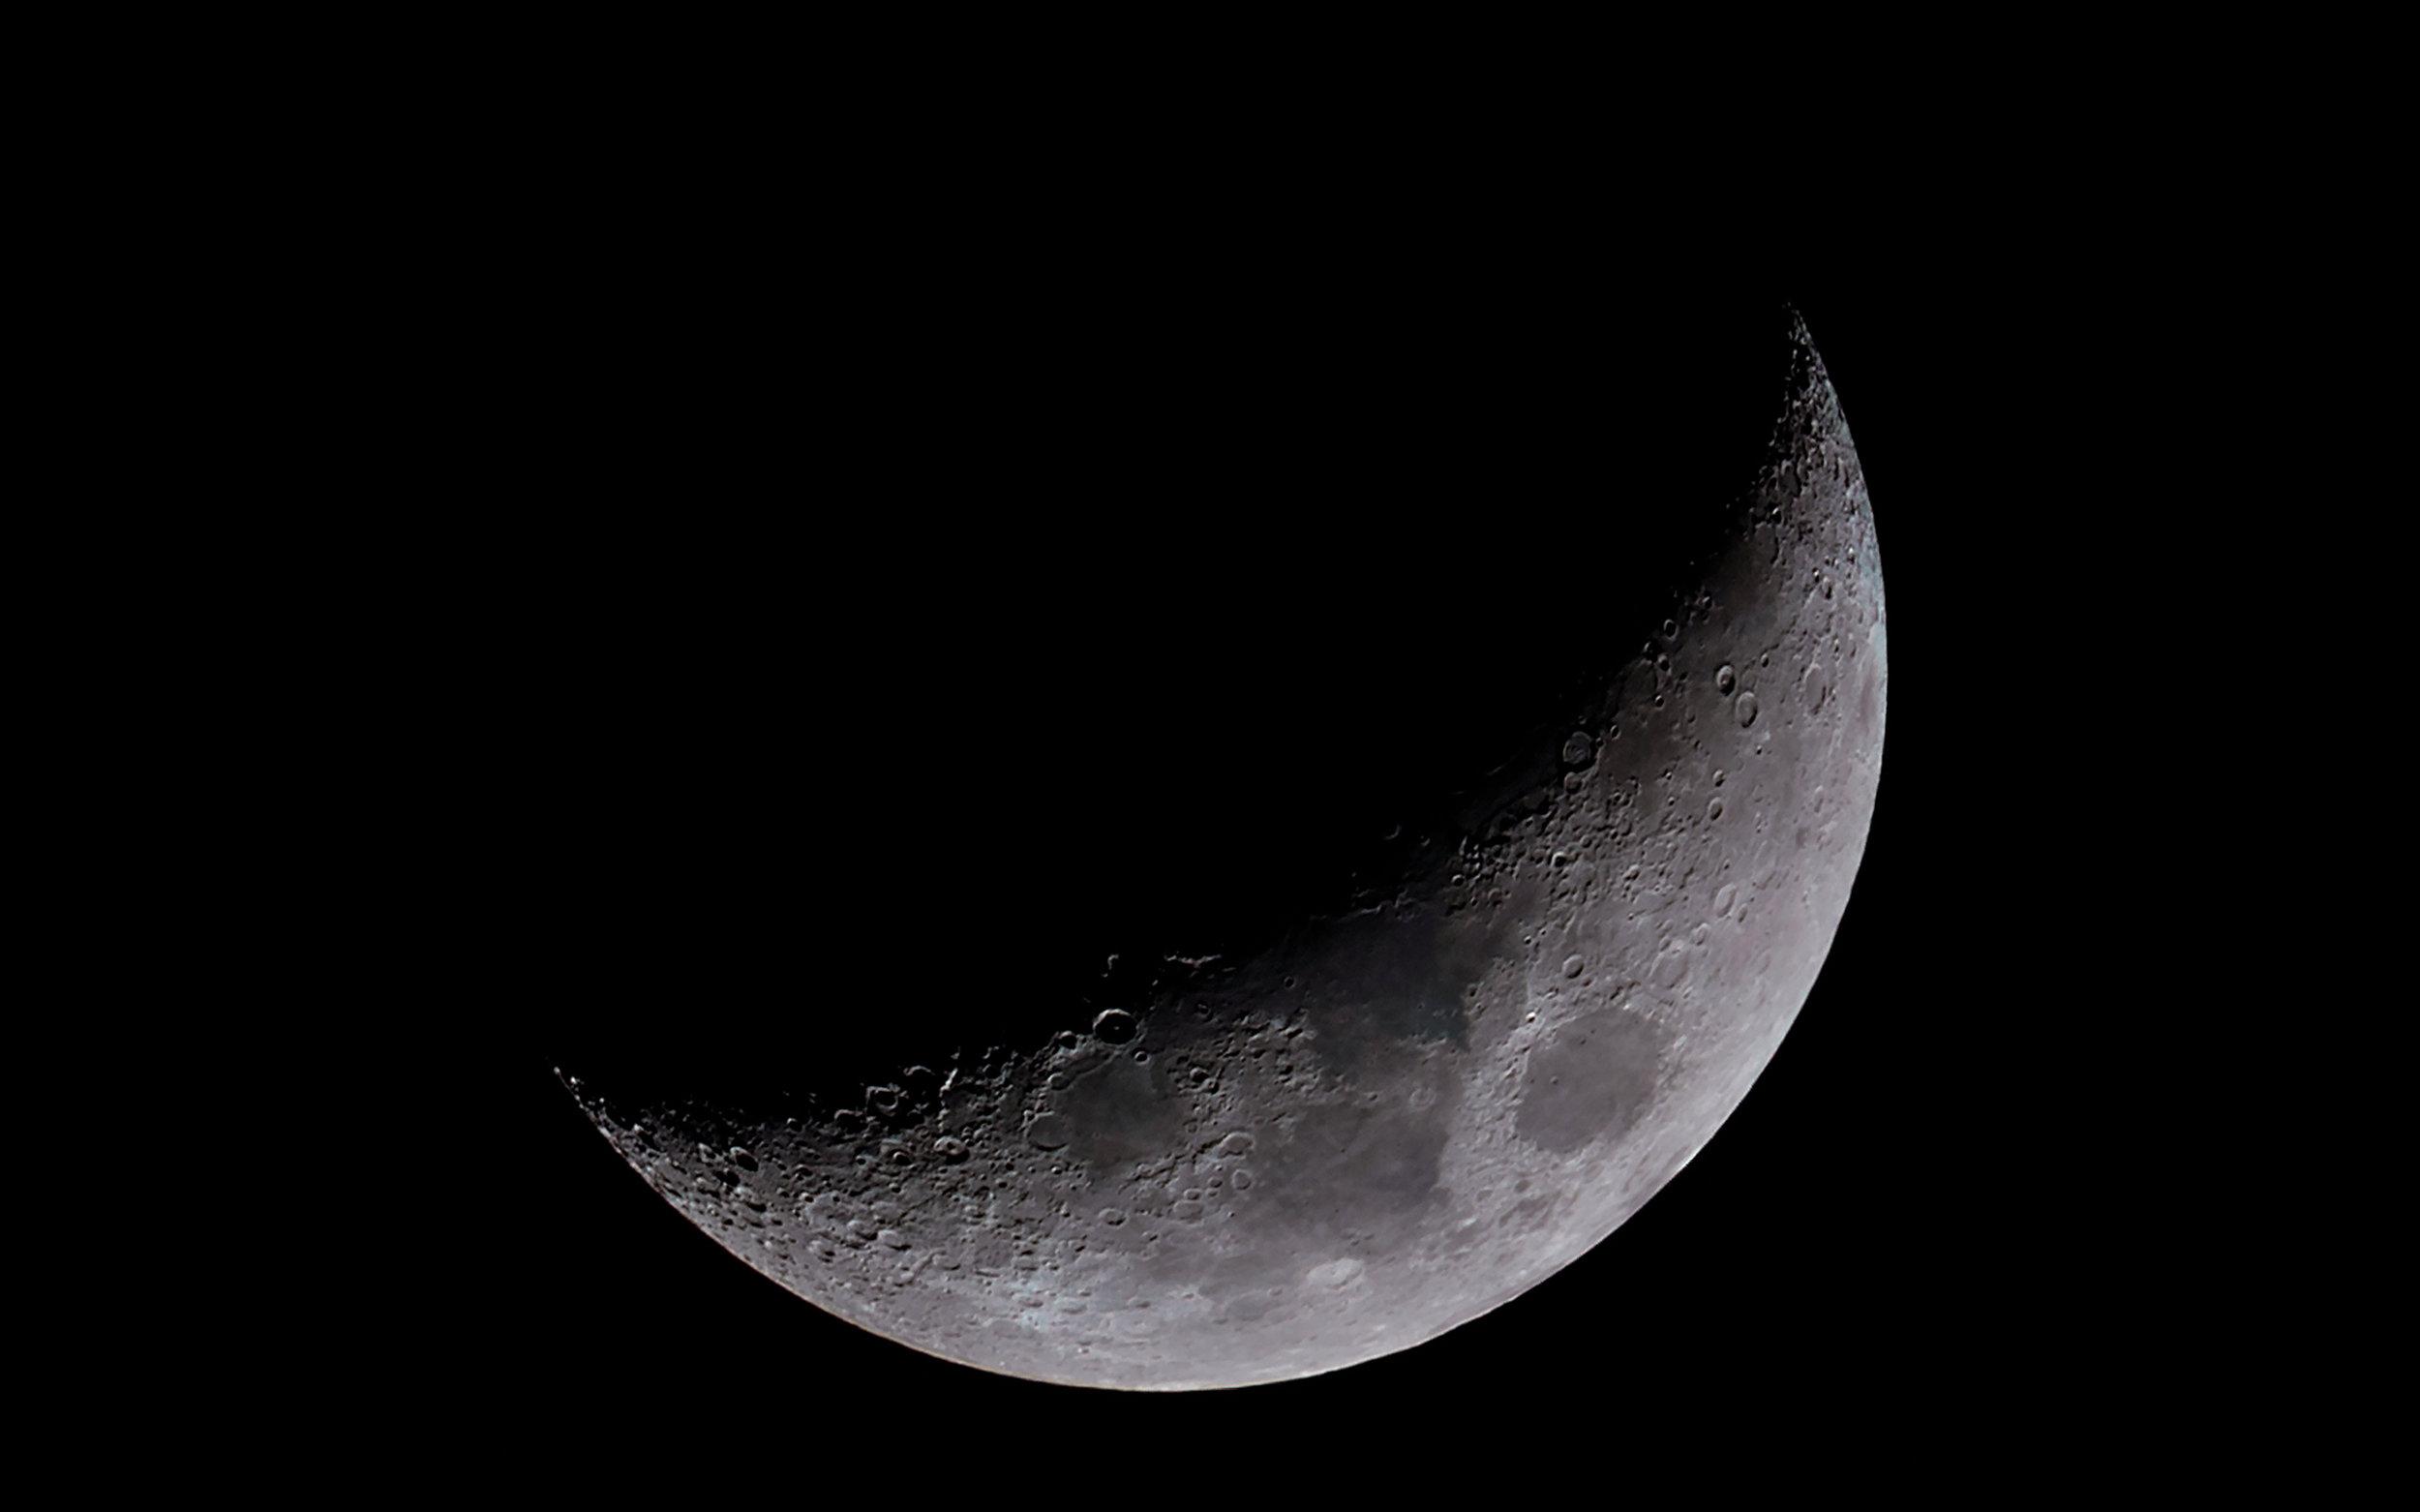 Waxing Crescent Moon 22% Illuminated 5 days old